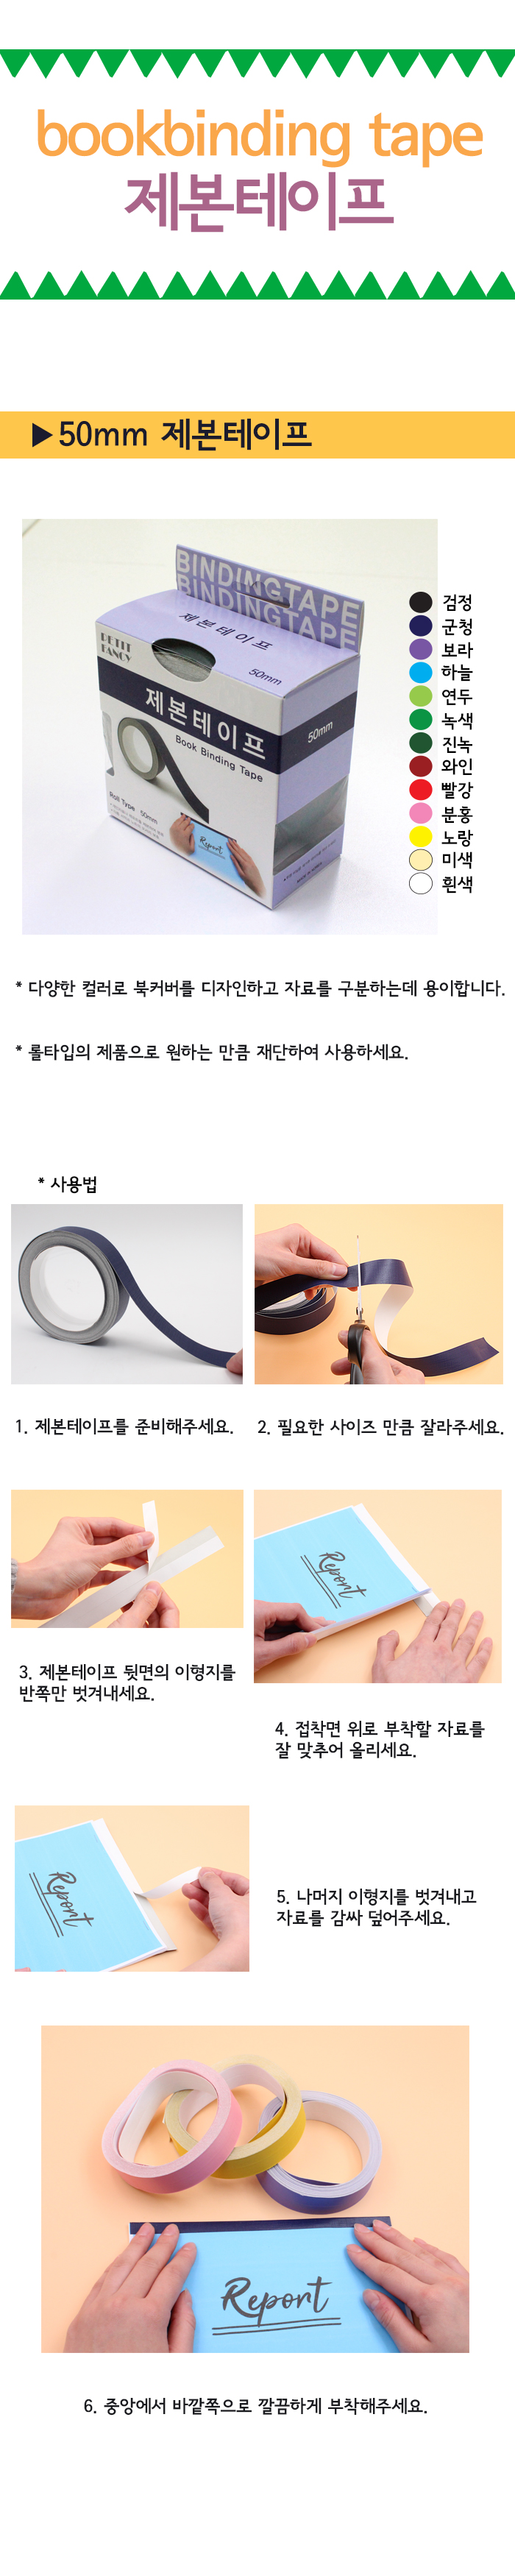 bookbinding_tape_50.jpg